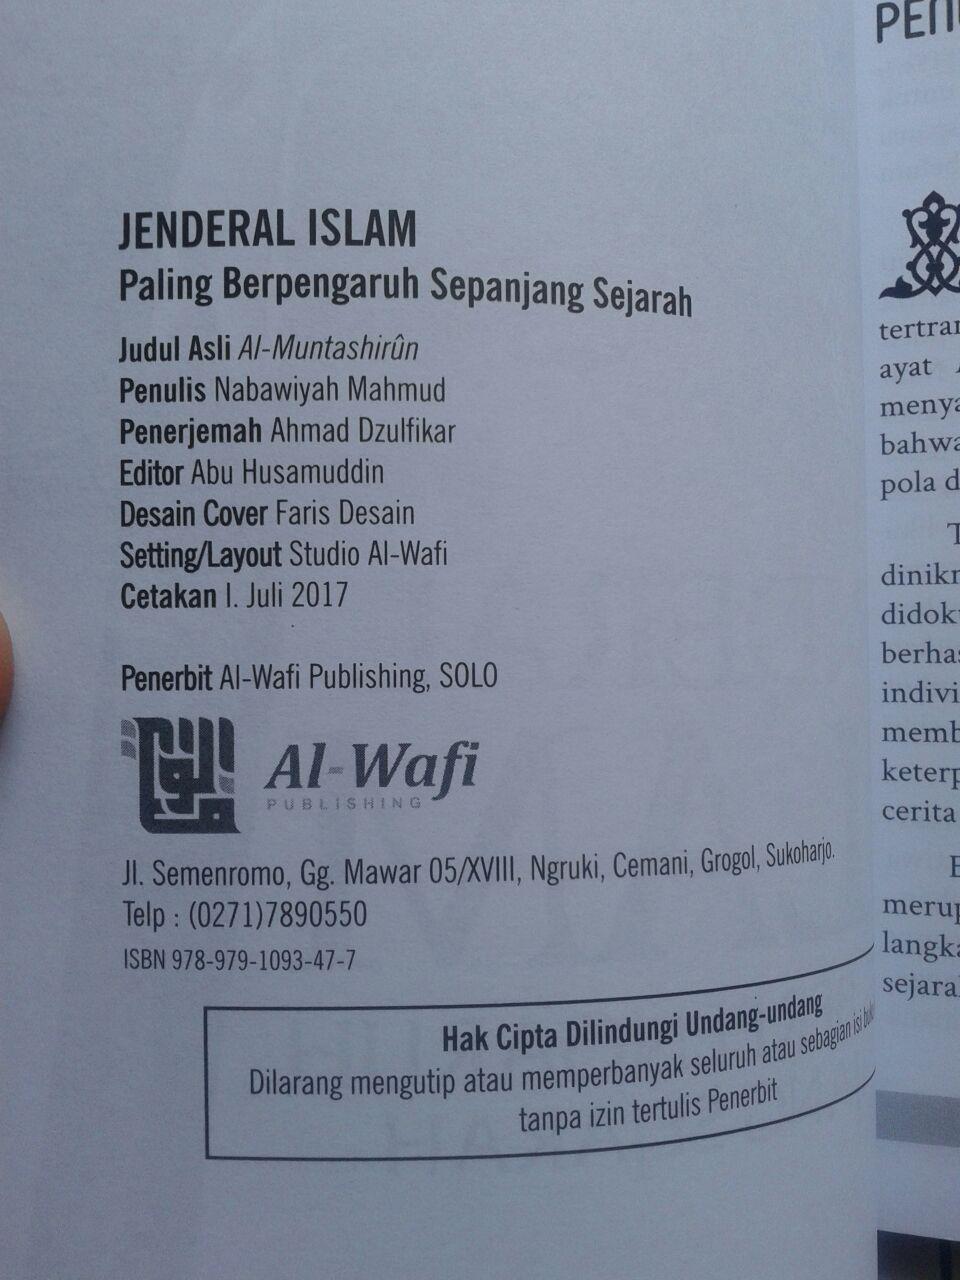 Buku Jenderal Islam Paling Berpengaruh Sepanjang Sejarah isi 5